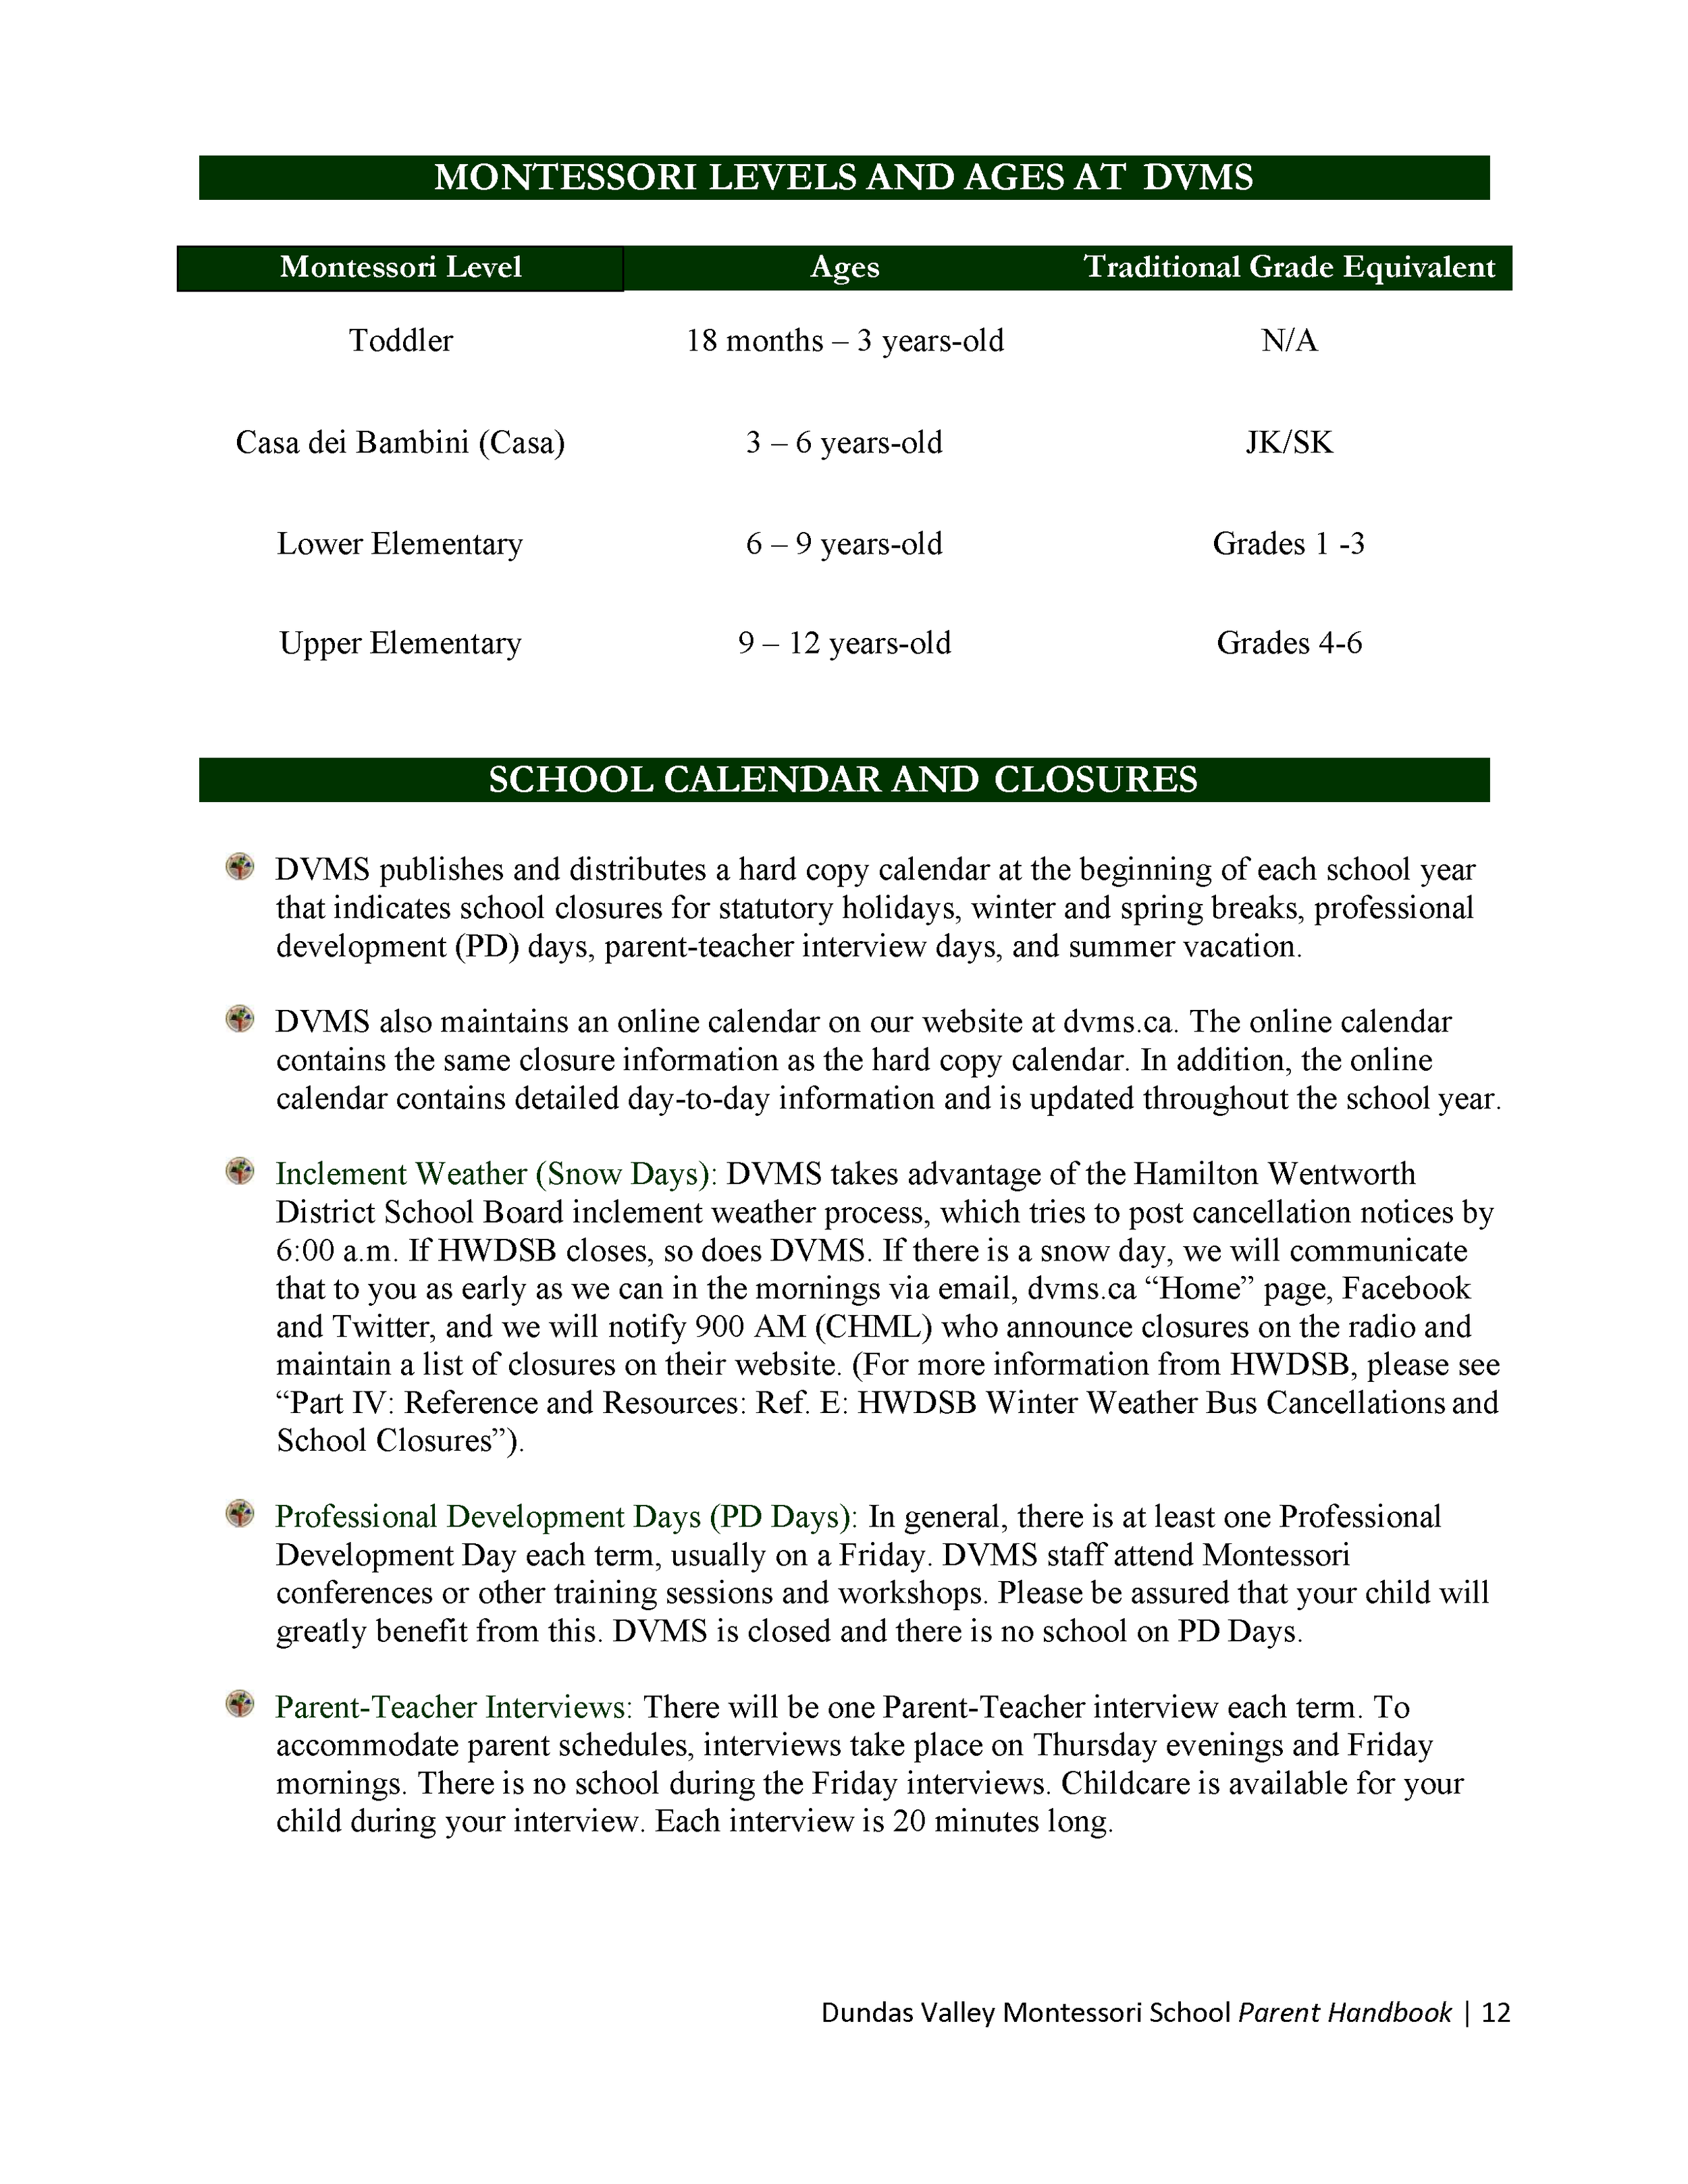 DVMS-Parent-Handbook-19-20_Page_014.png